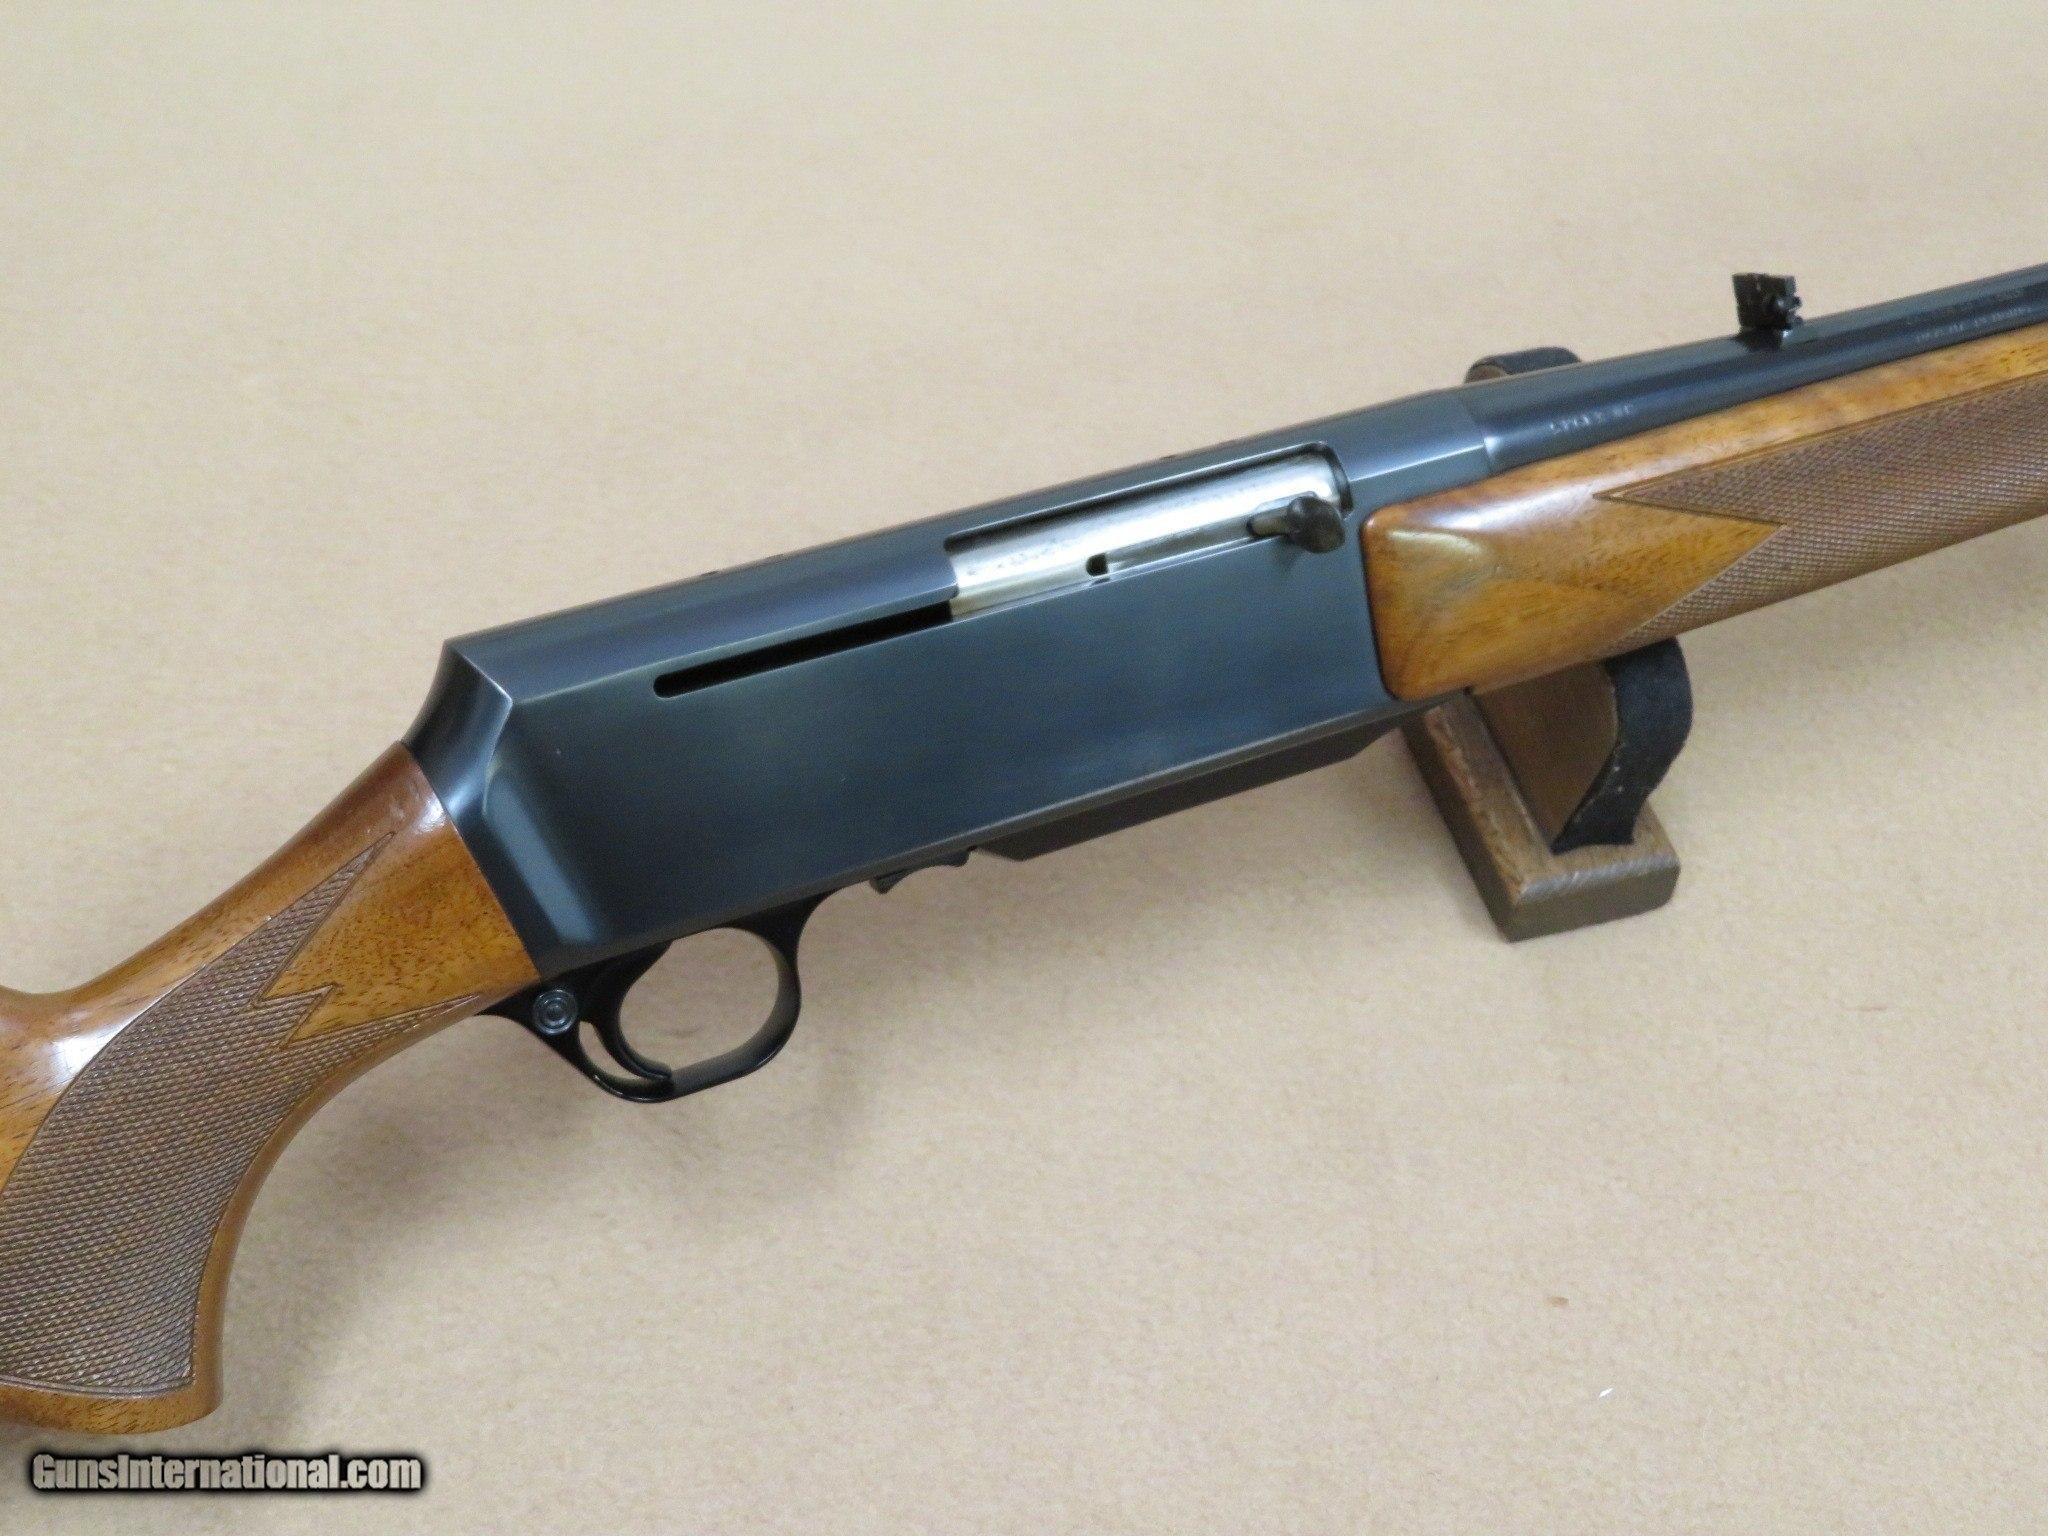 Browning Auto 5 shotgun manufacture date